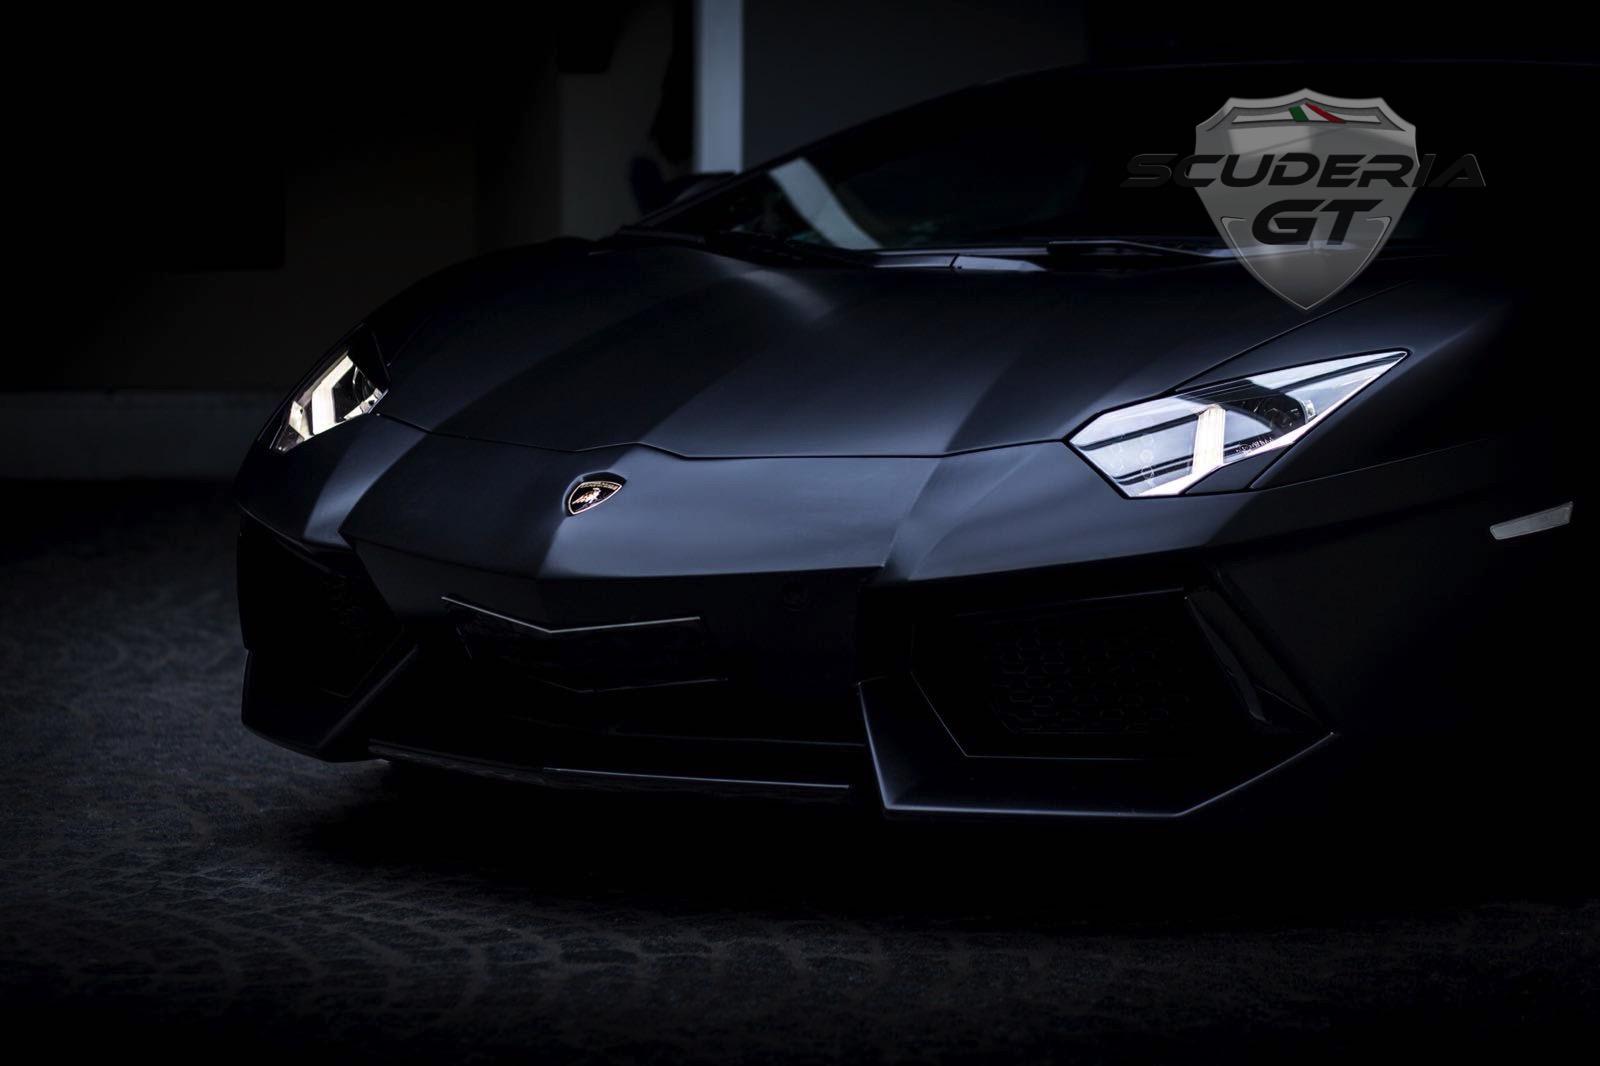 Lamborghini Aventador LP700-4 (SOLD)